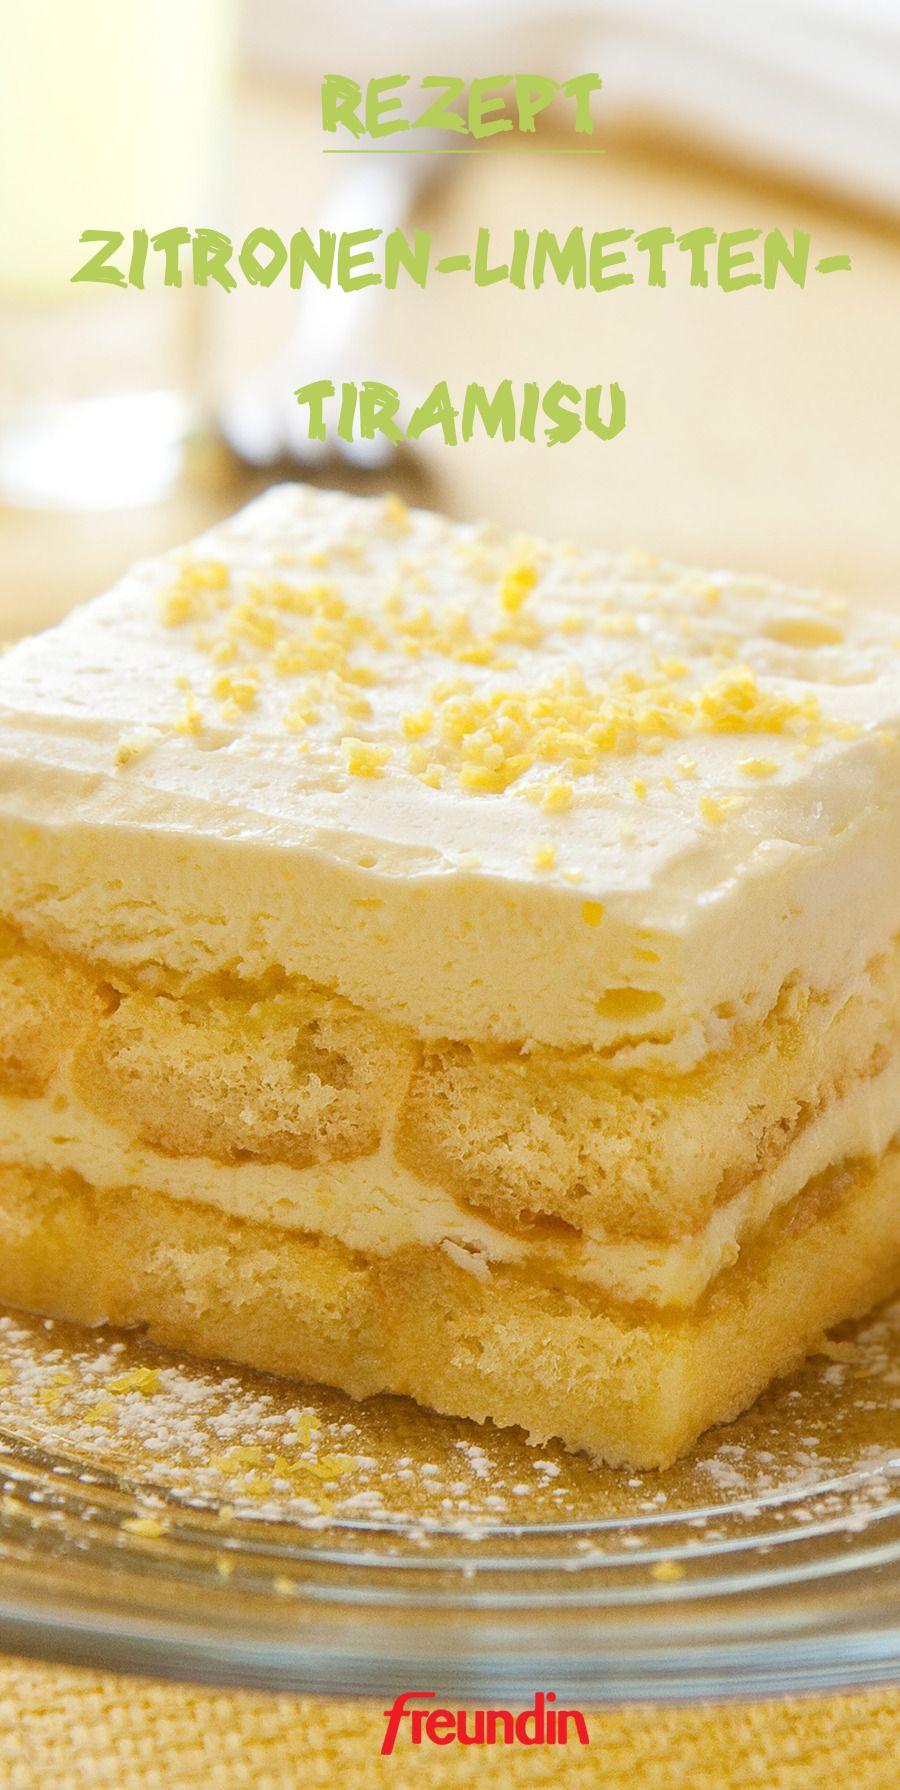 Rezept: Erfrischendes Zitronen-Limetten-Tiramisu | freundin.de